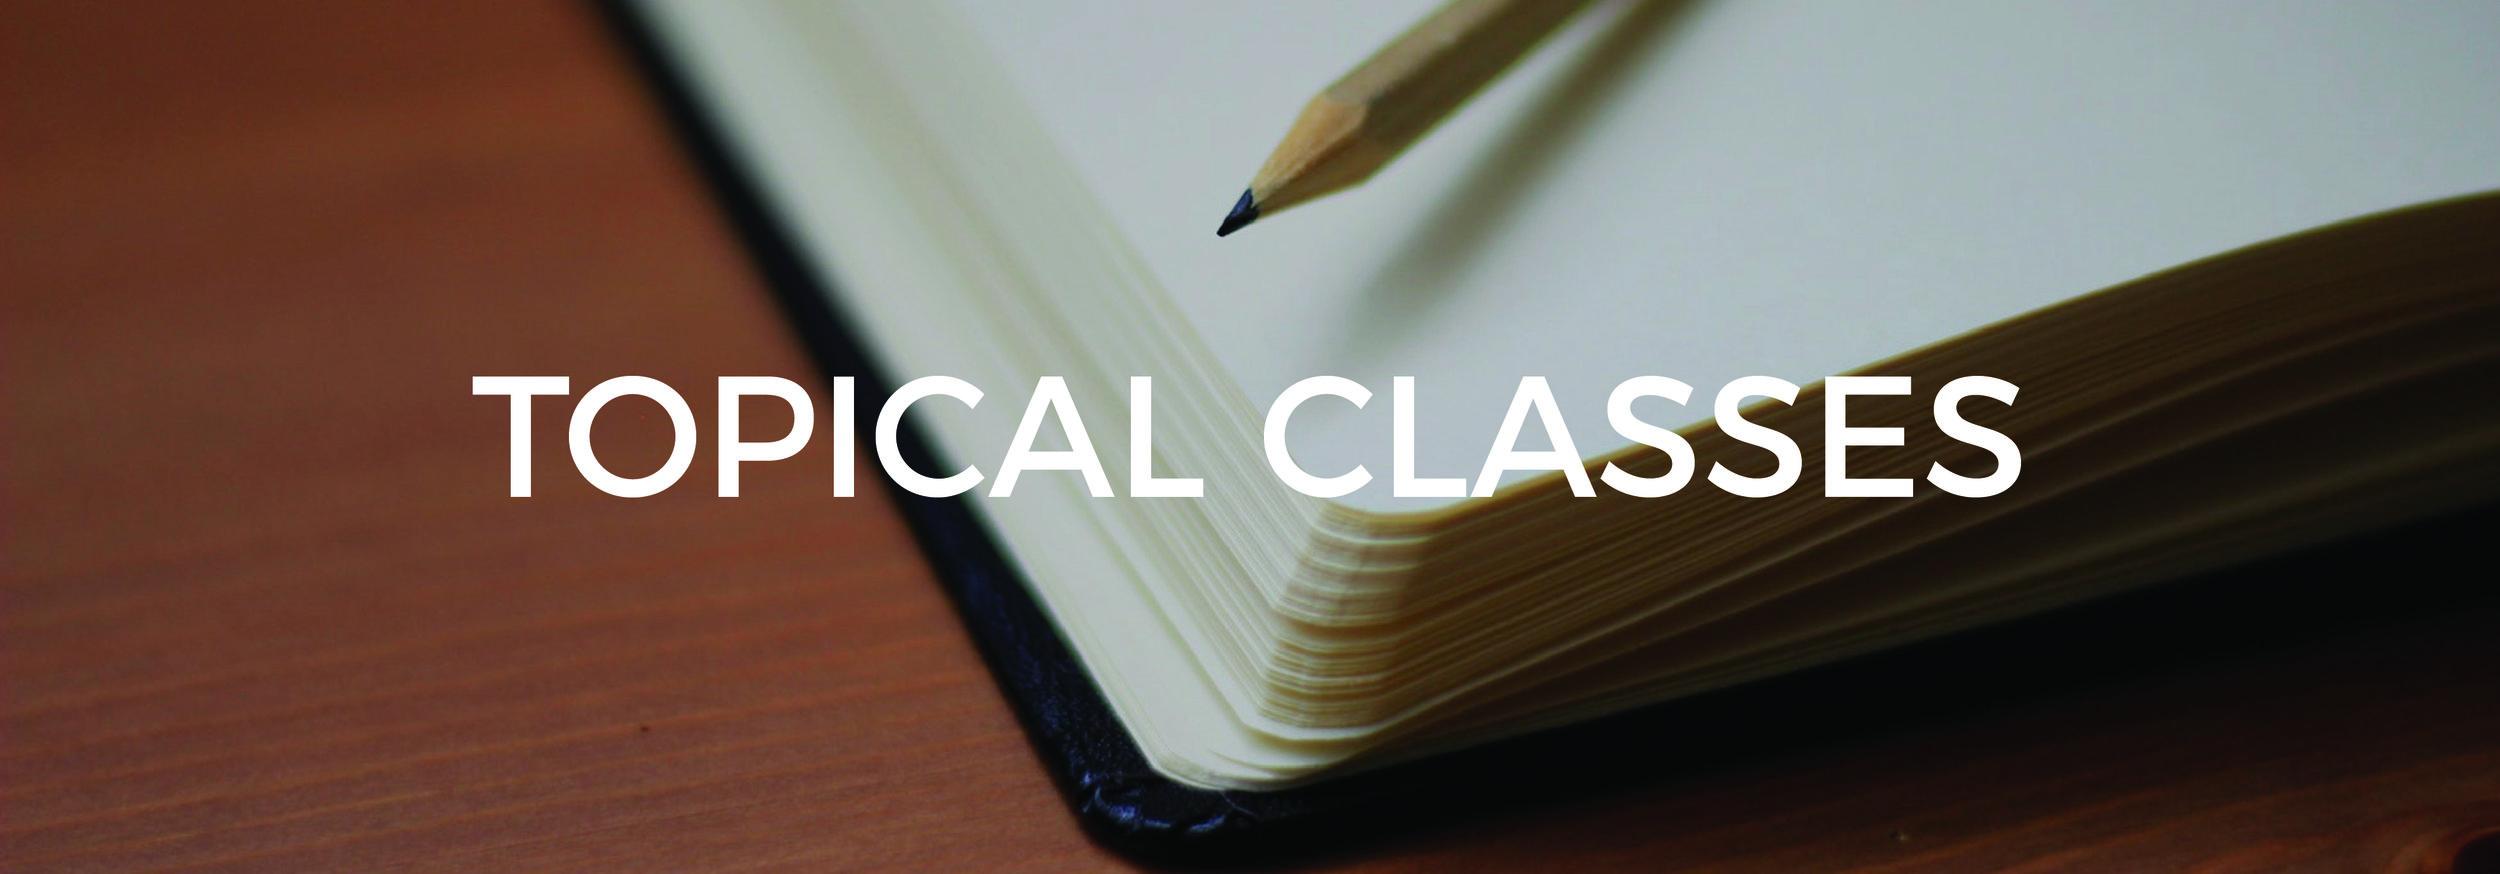 Topical Classes-17.jpg